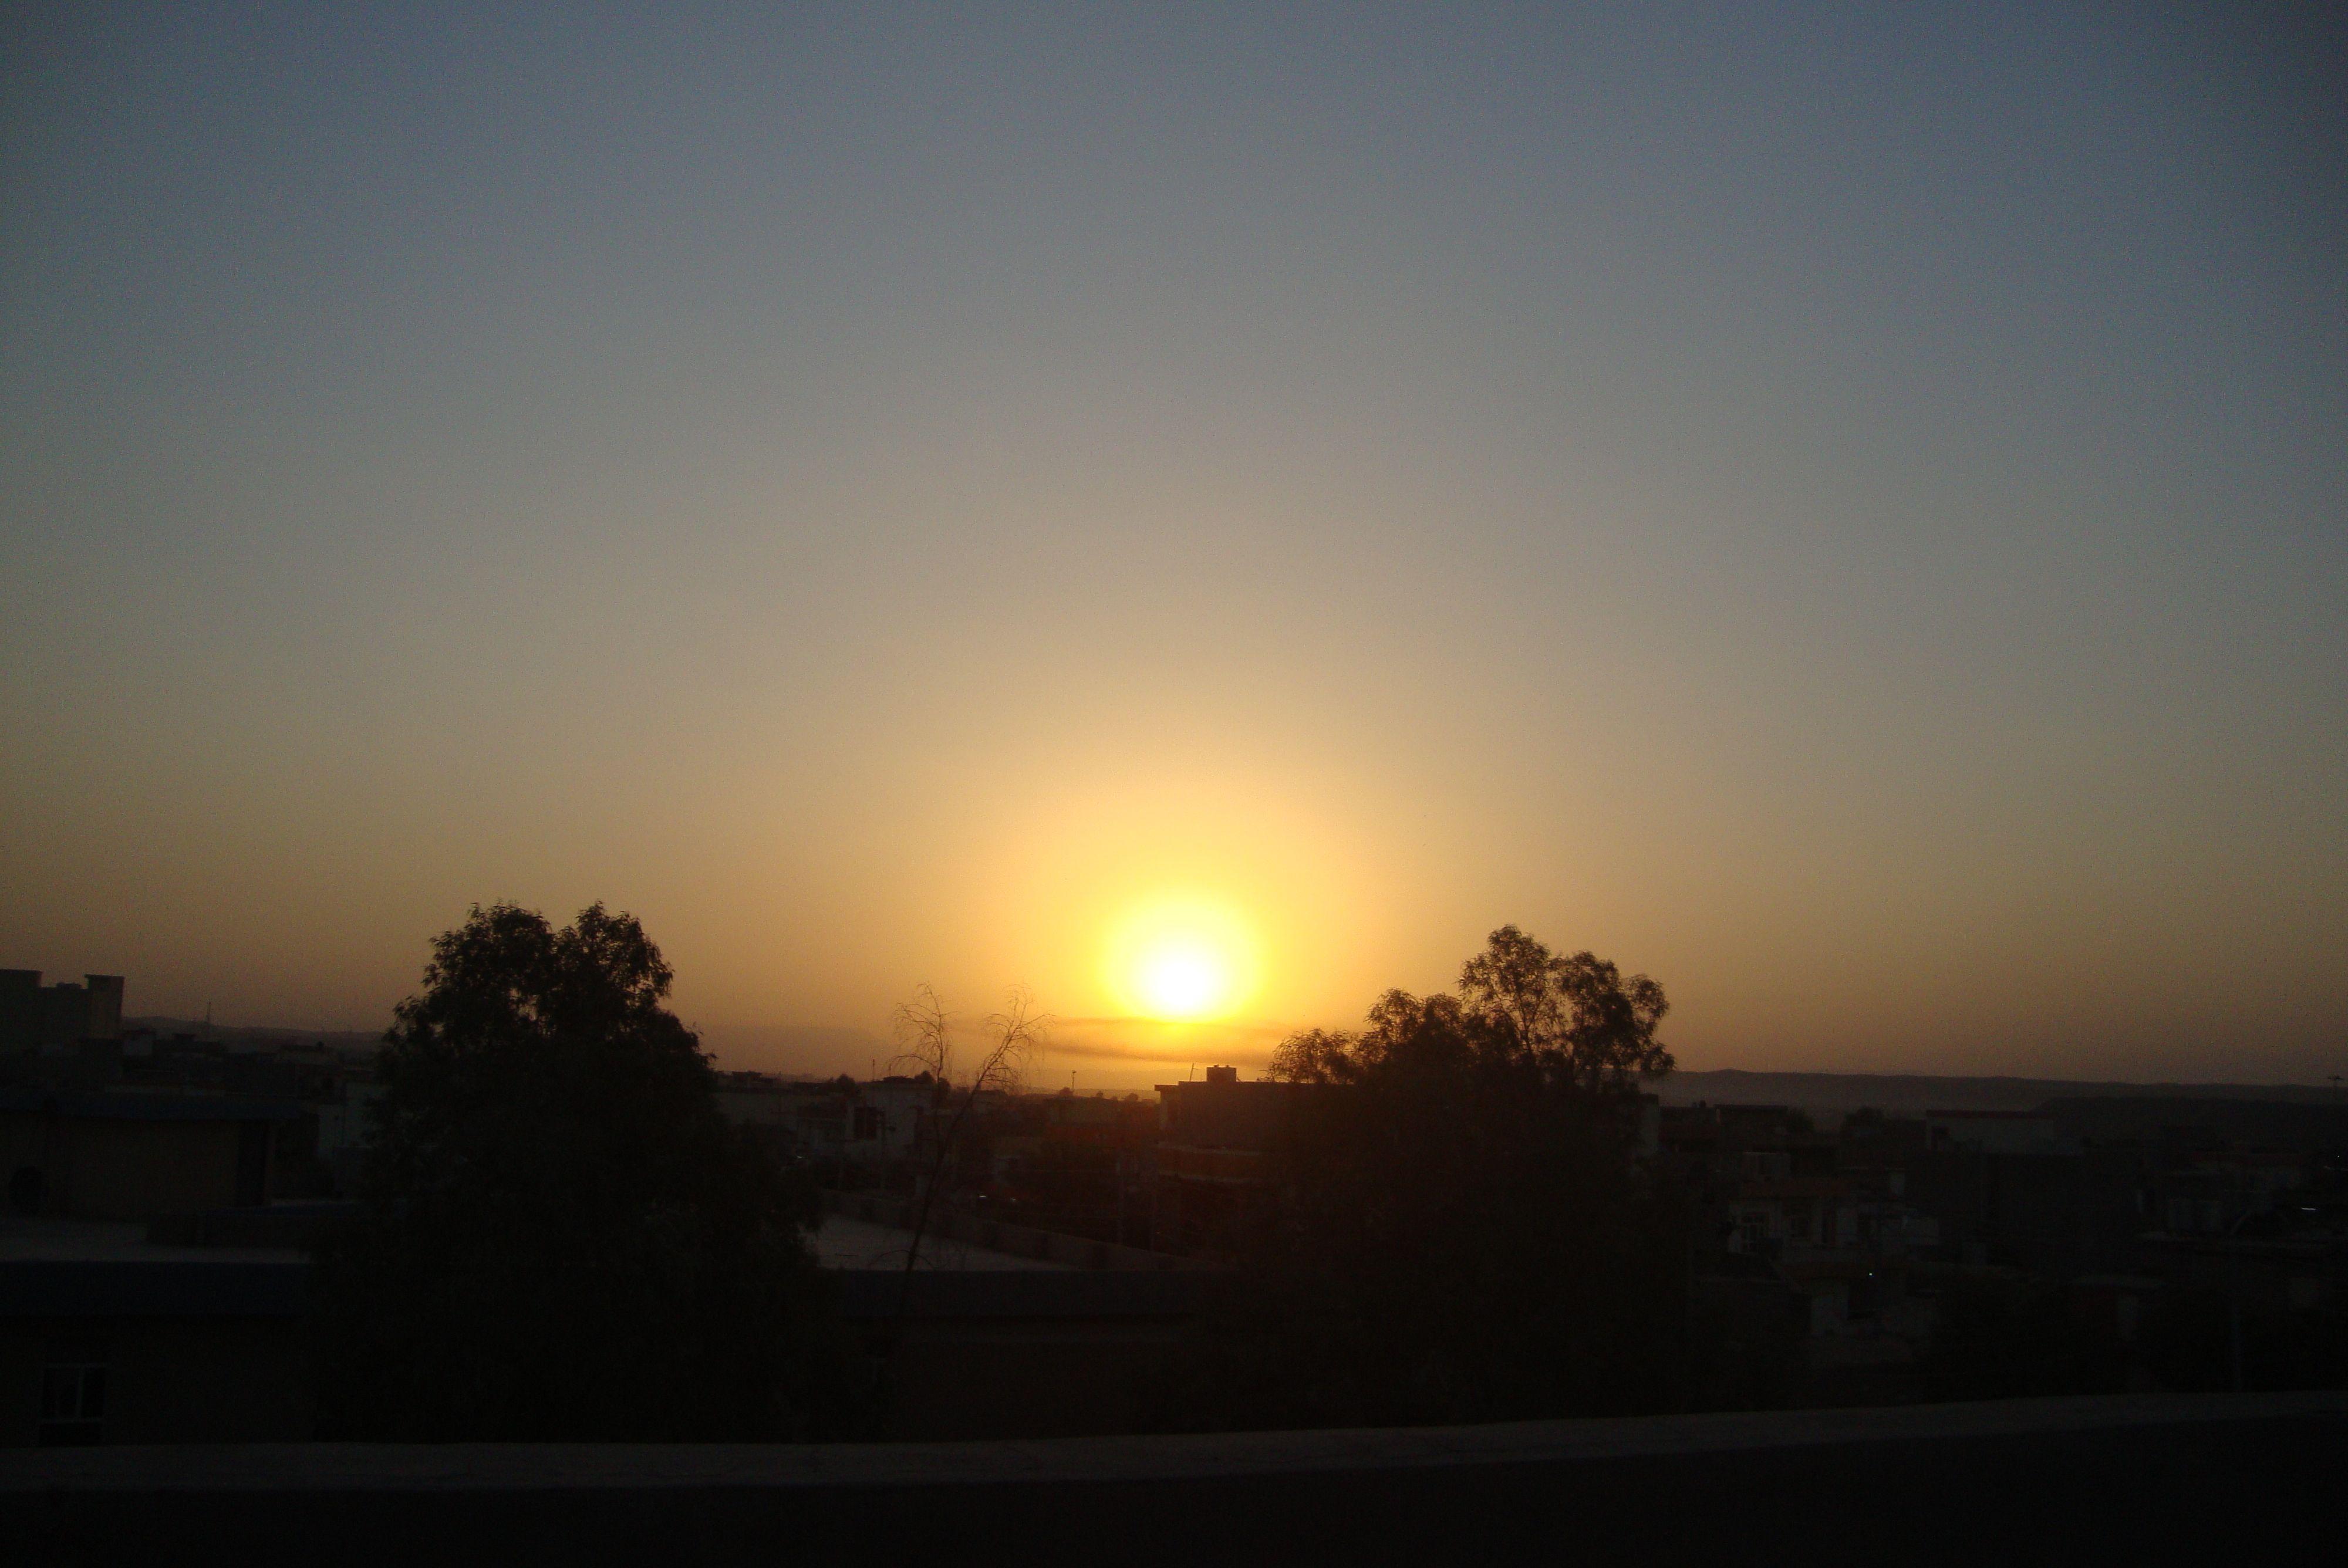 شروق الشمس Outdoor Celestial Sunset